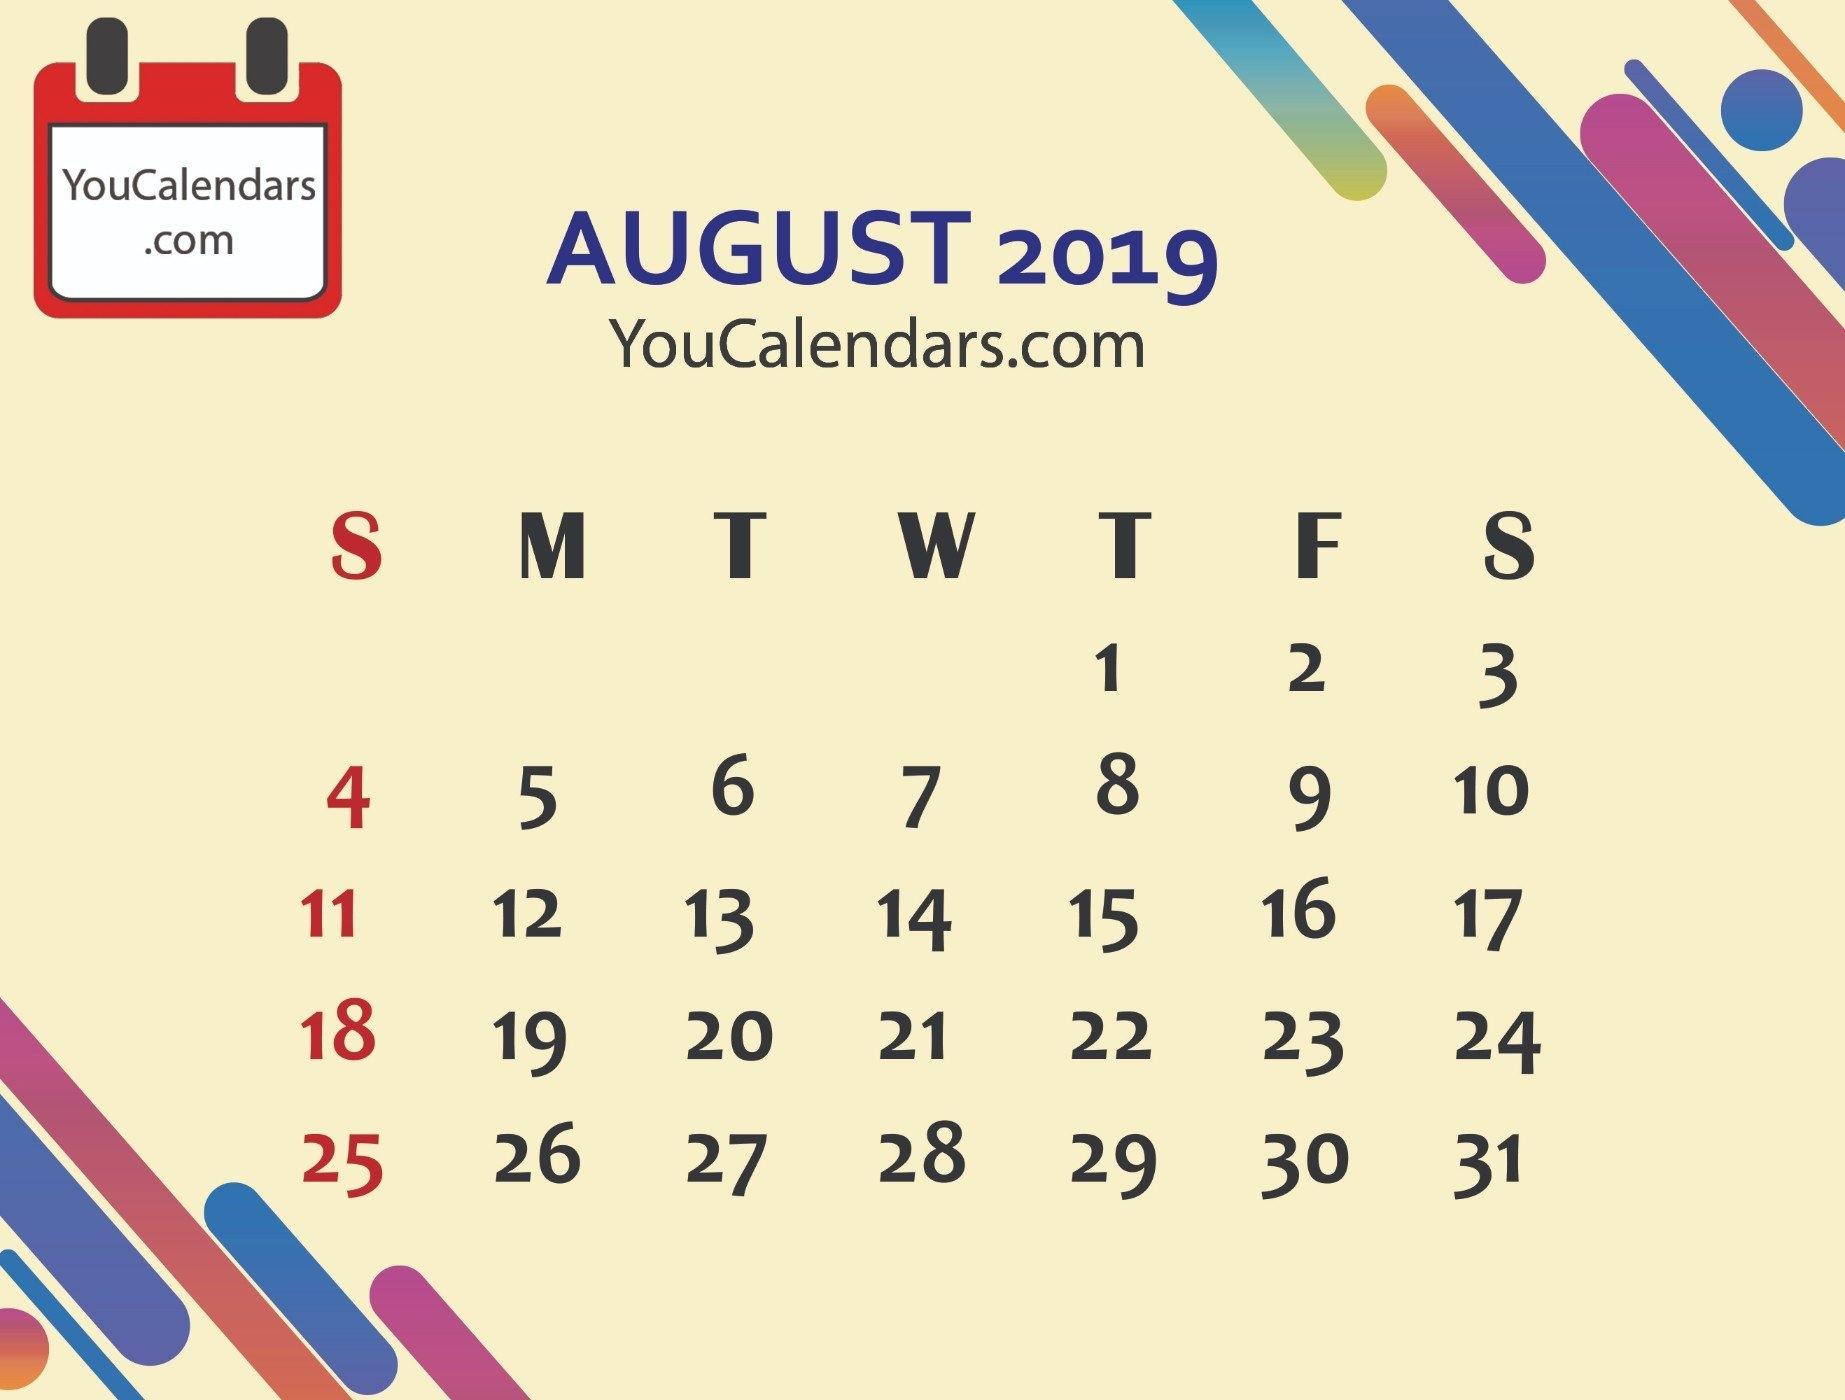 Free August 2019 Calendar Printable Template – You Calendars 8 August 2019 Calendar